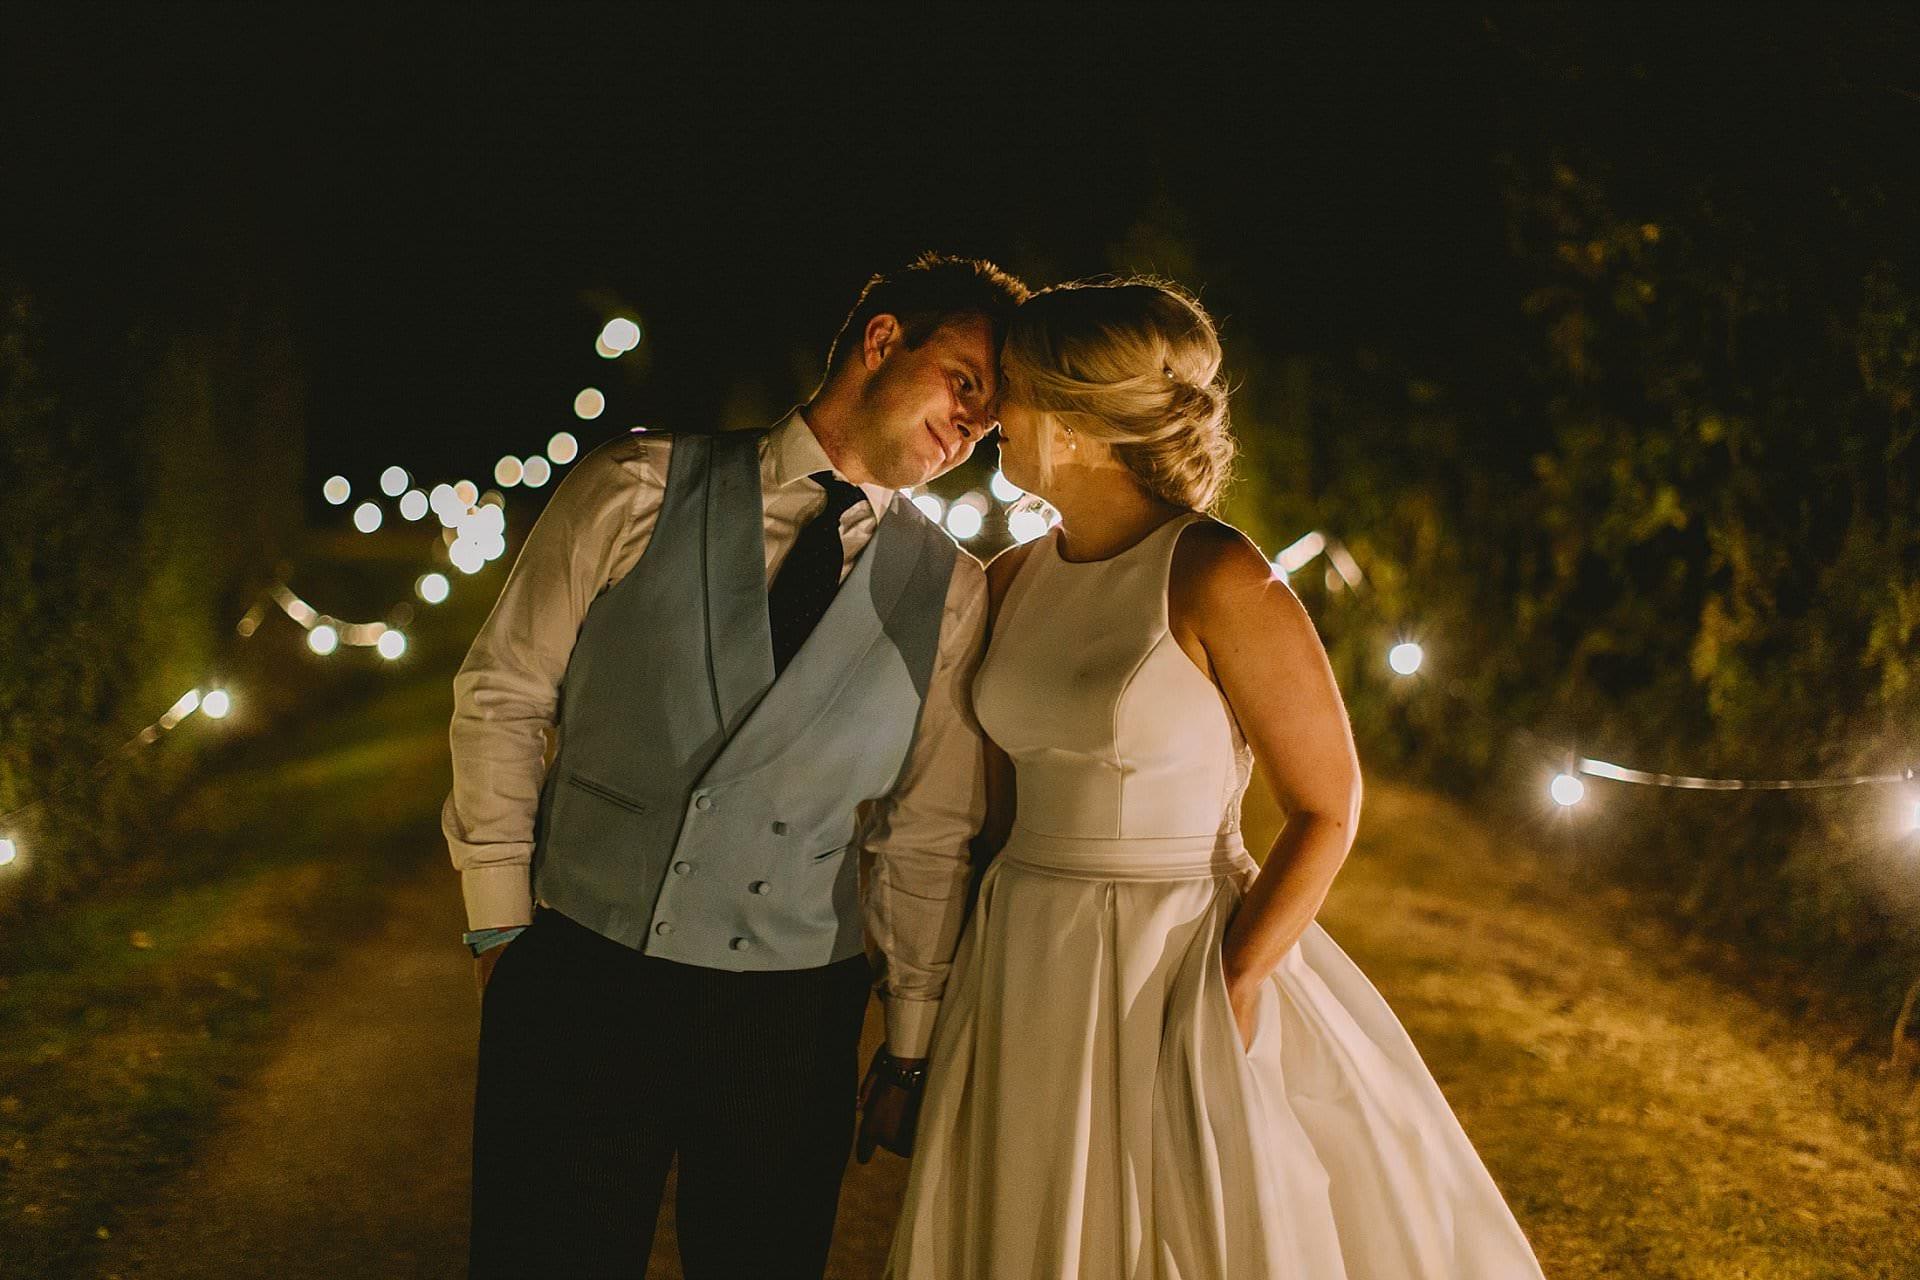 Couple kiss at home wedding - at nighttime